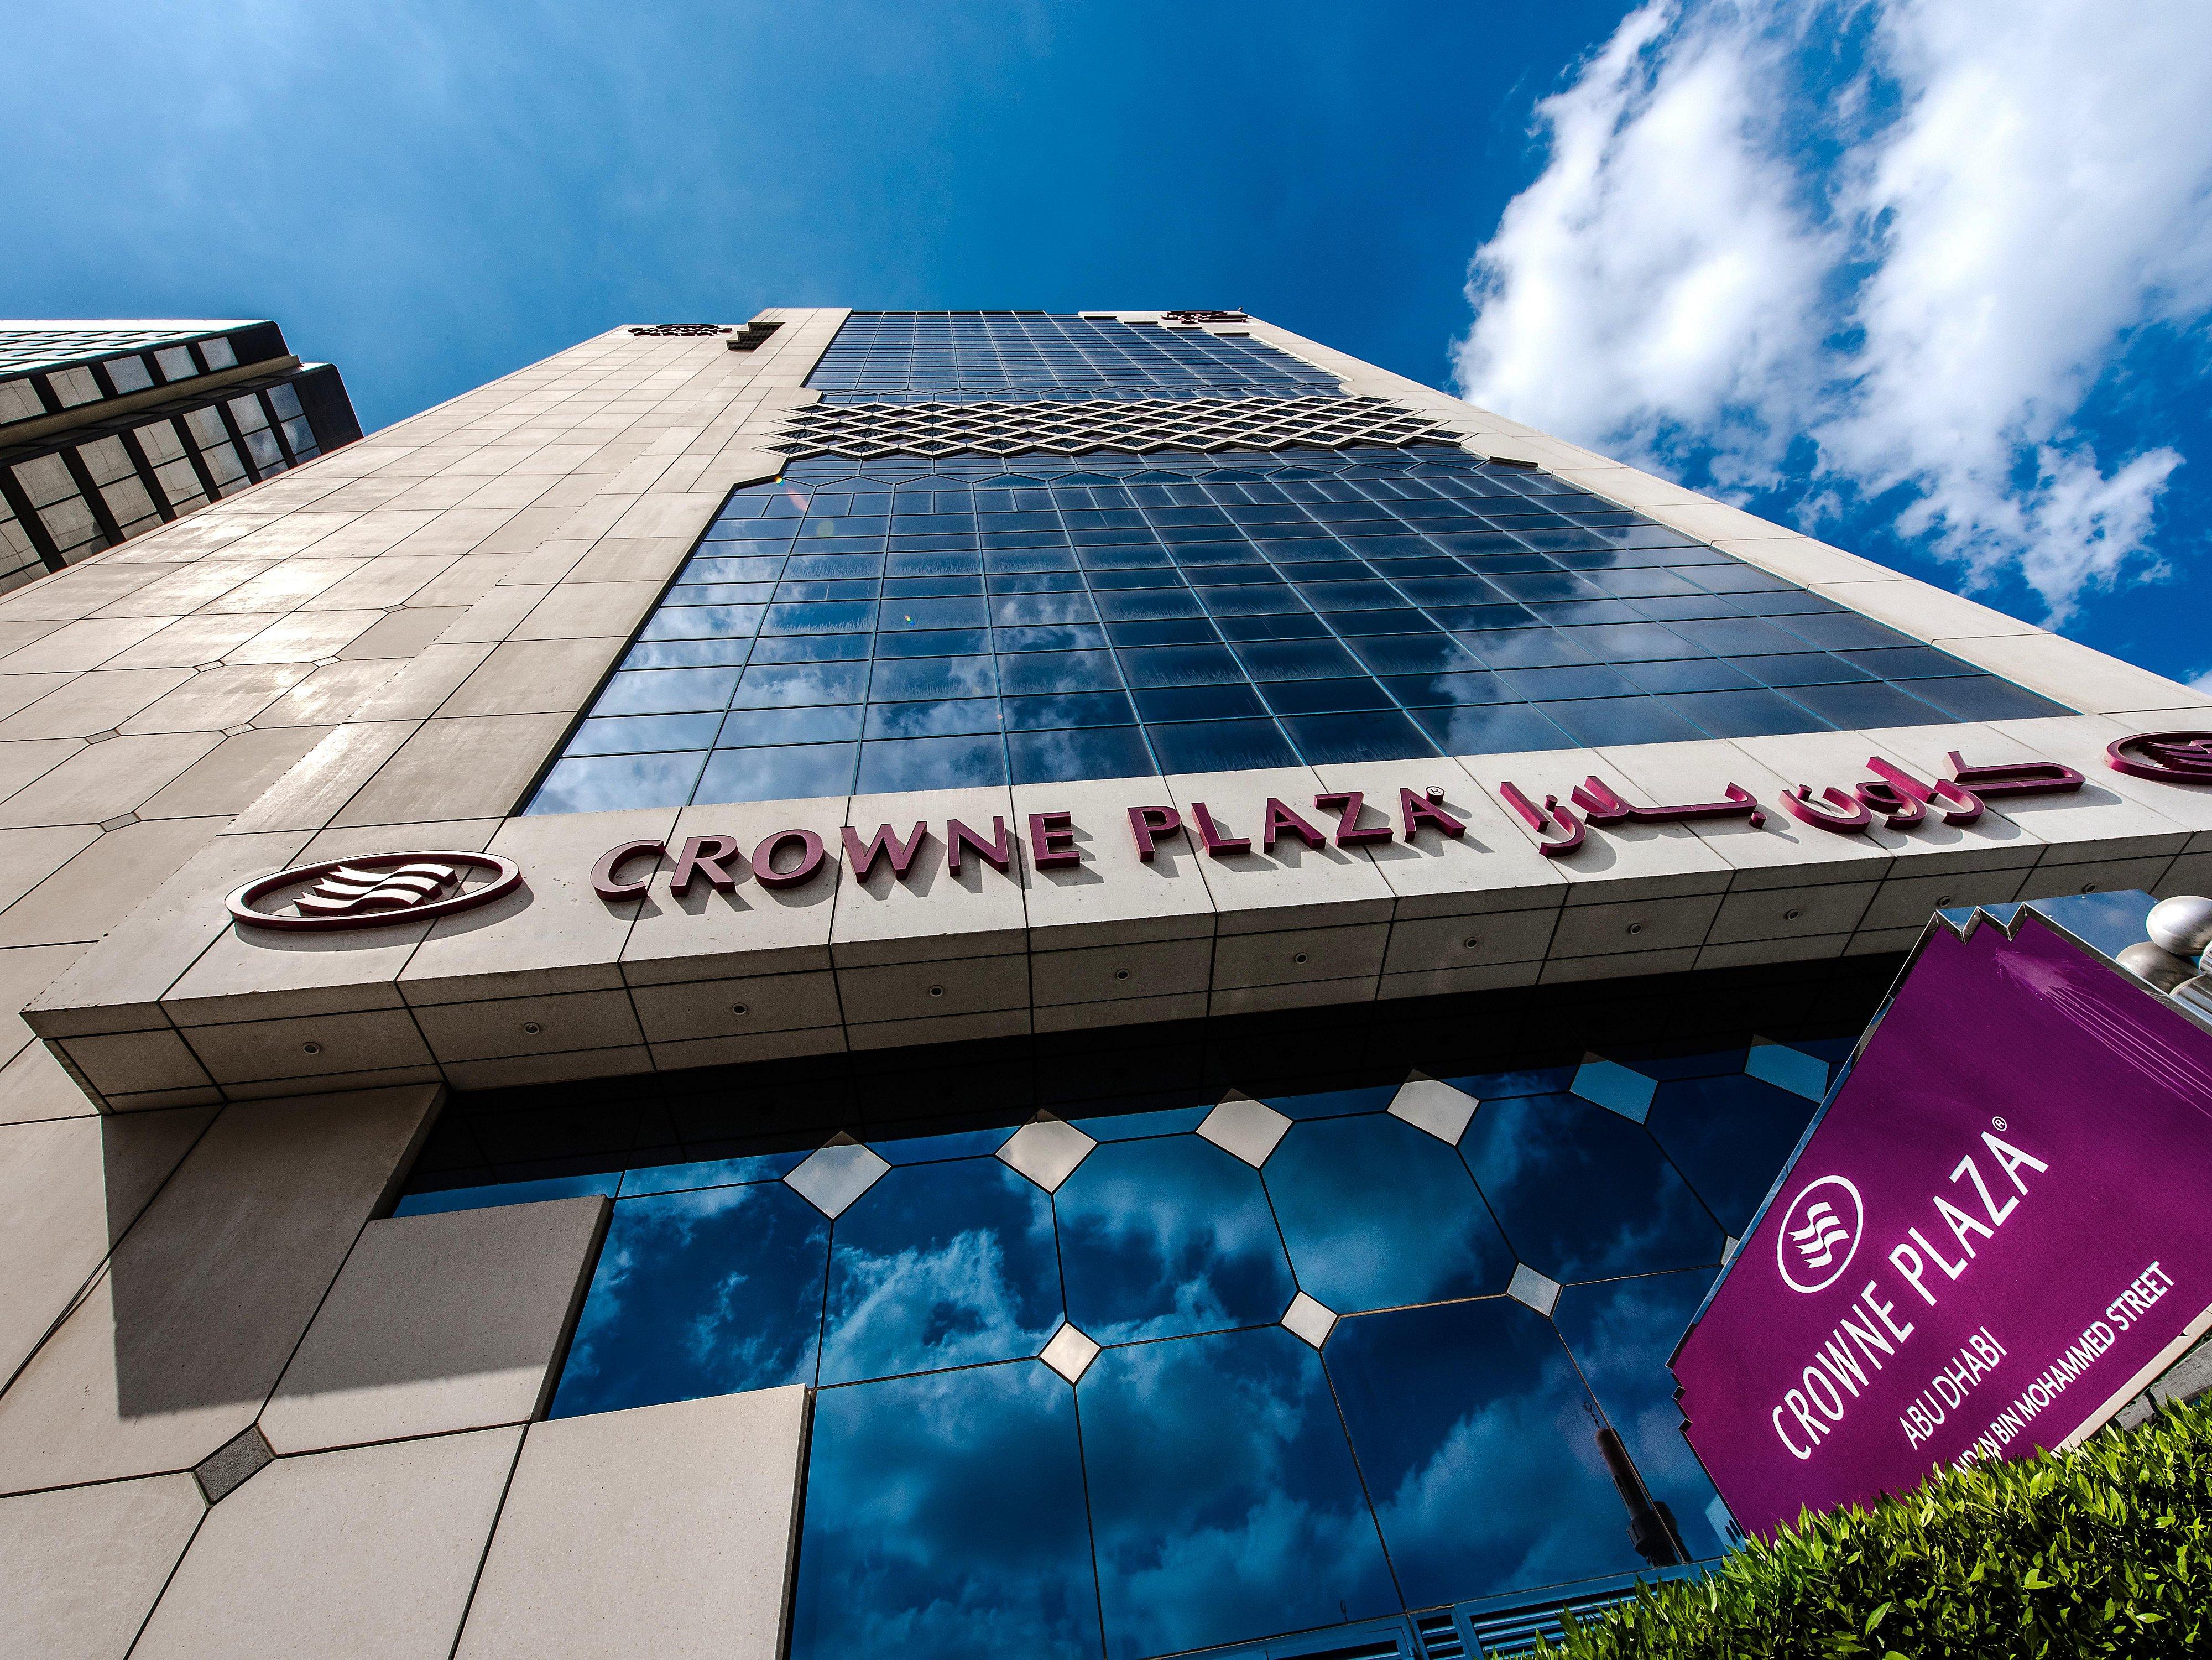 Business Hotel In Abu Dhabi Crowne Plaza Abu Dhabi Hotel